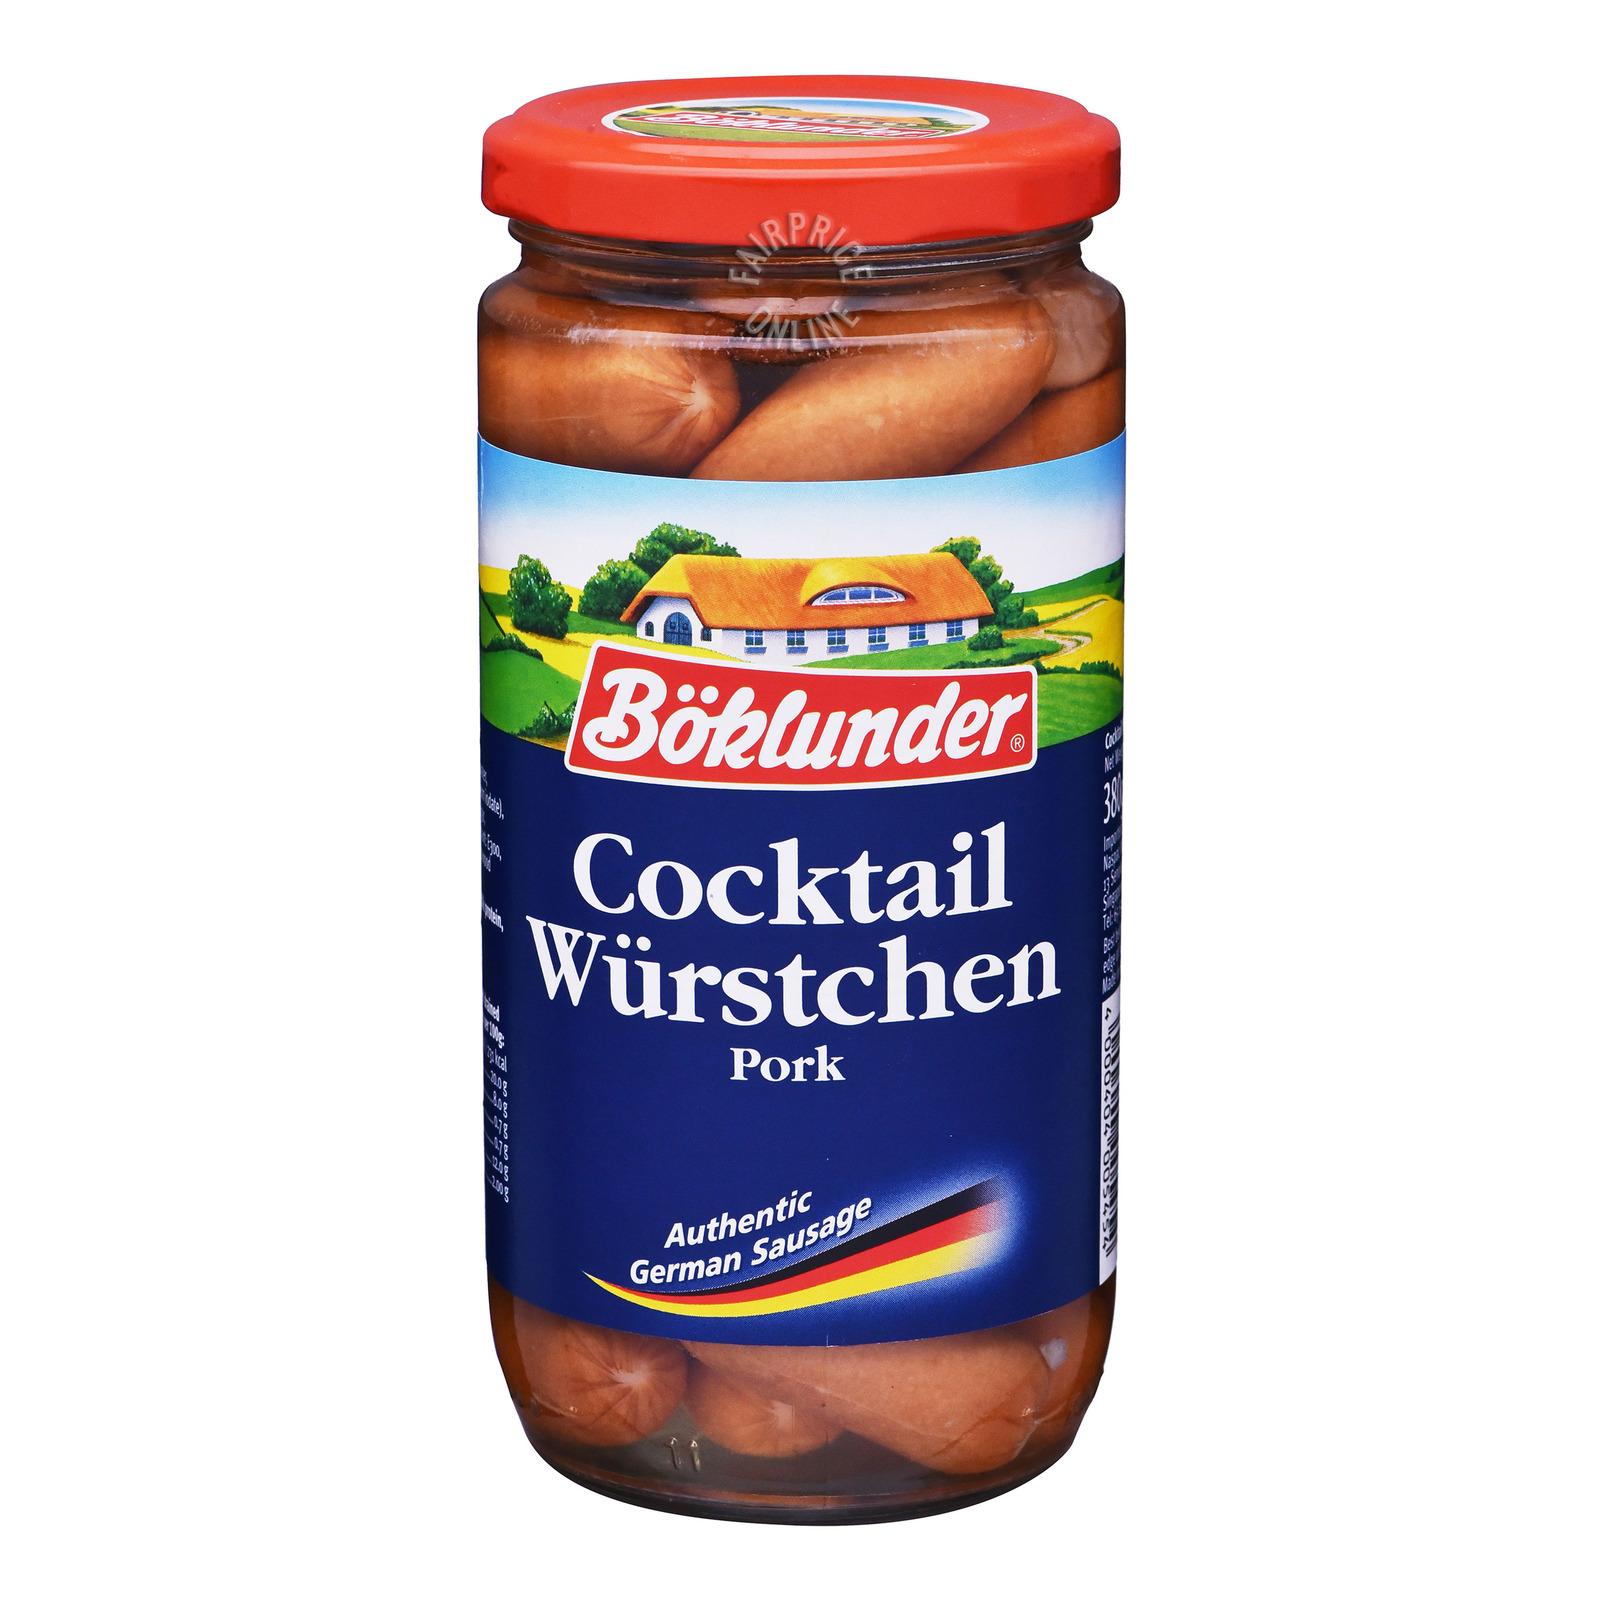 Boklunder German Sausages - Pork (Cocktail)